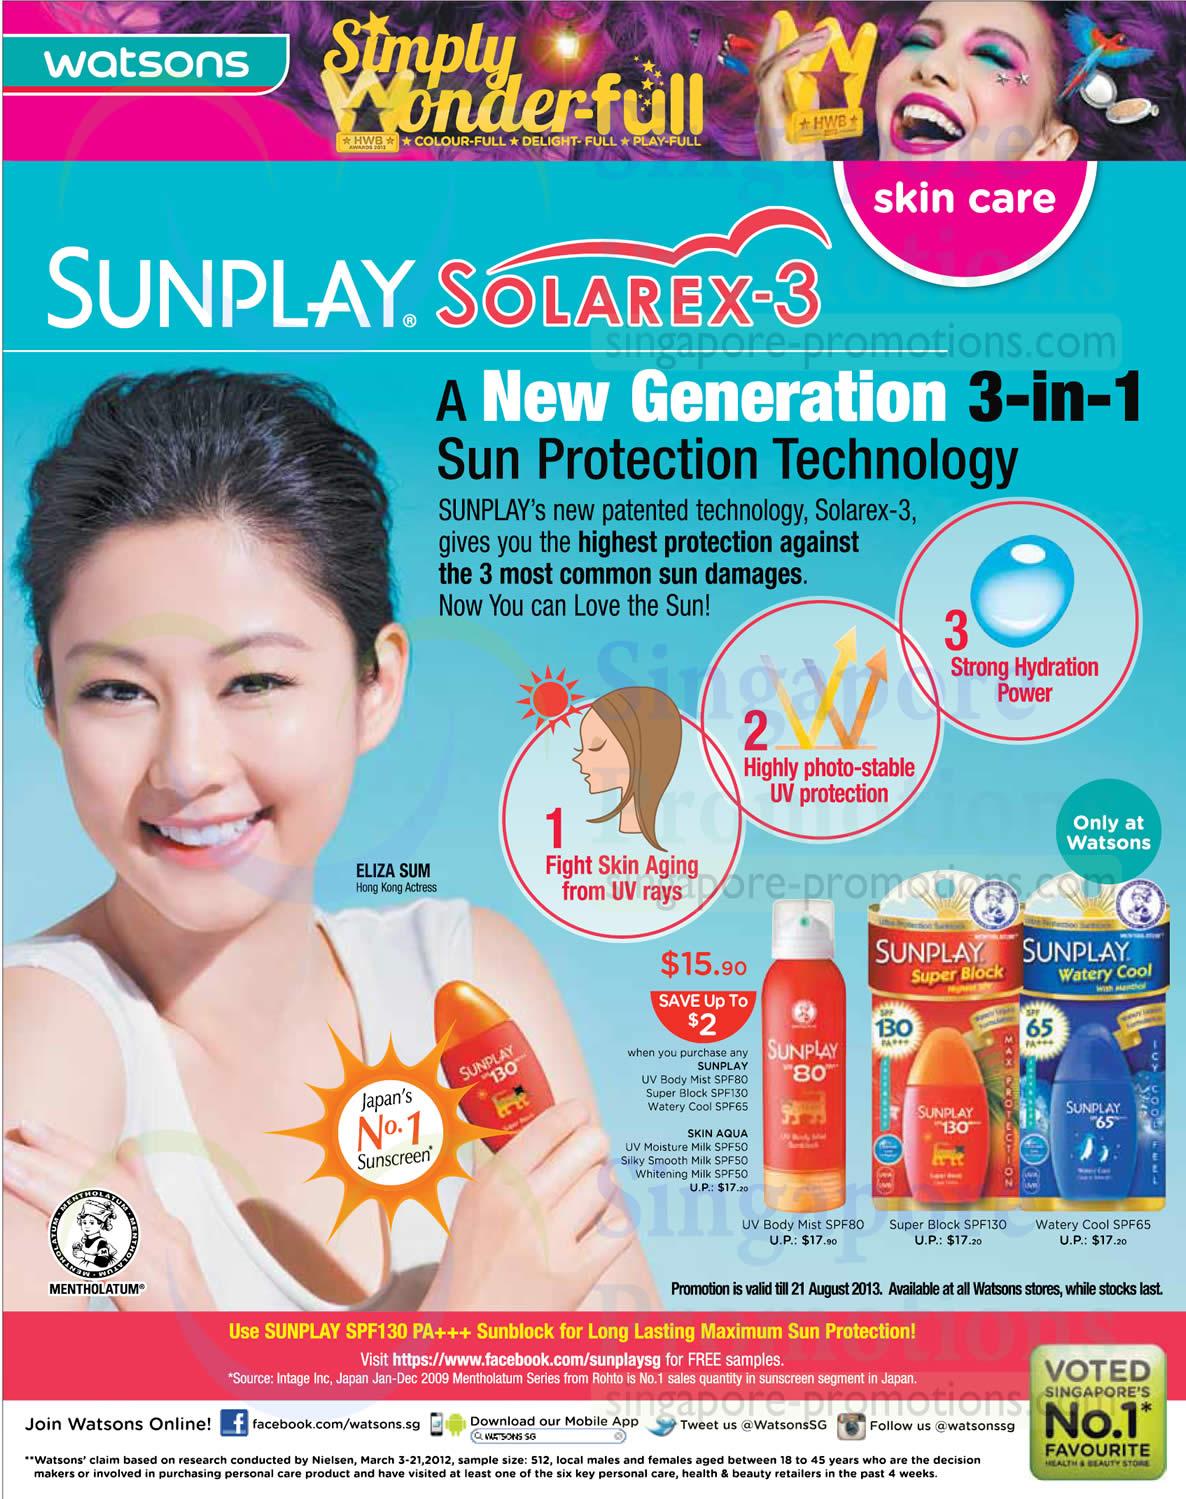 Sunplay Solarex-3